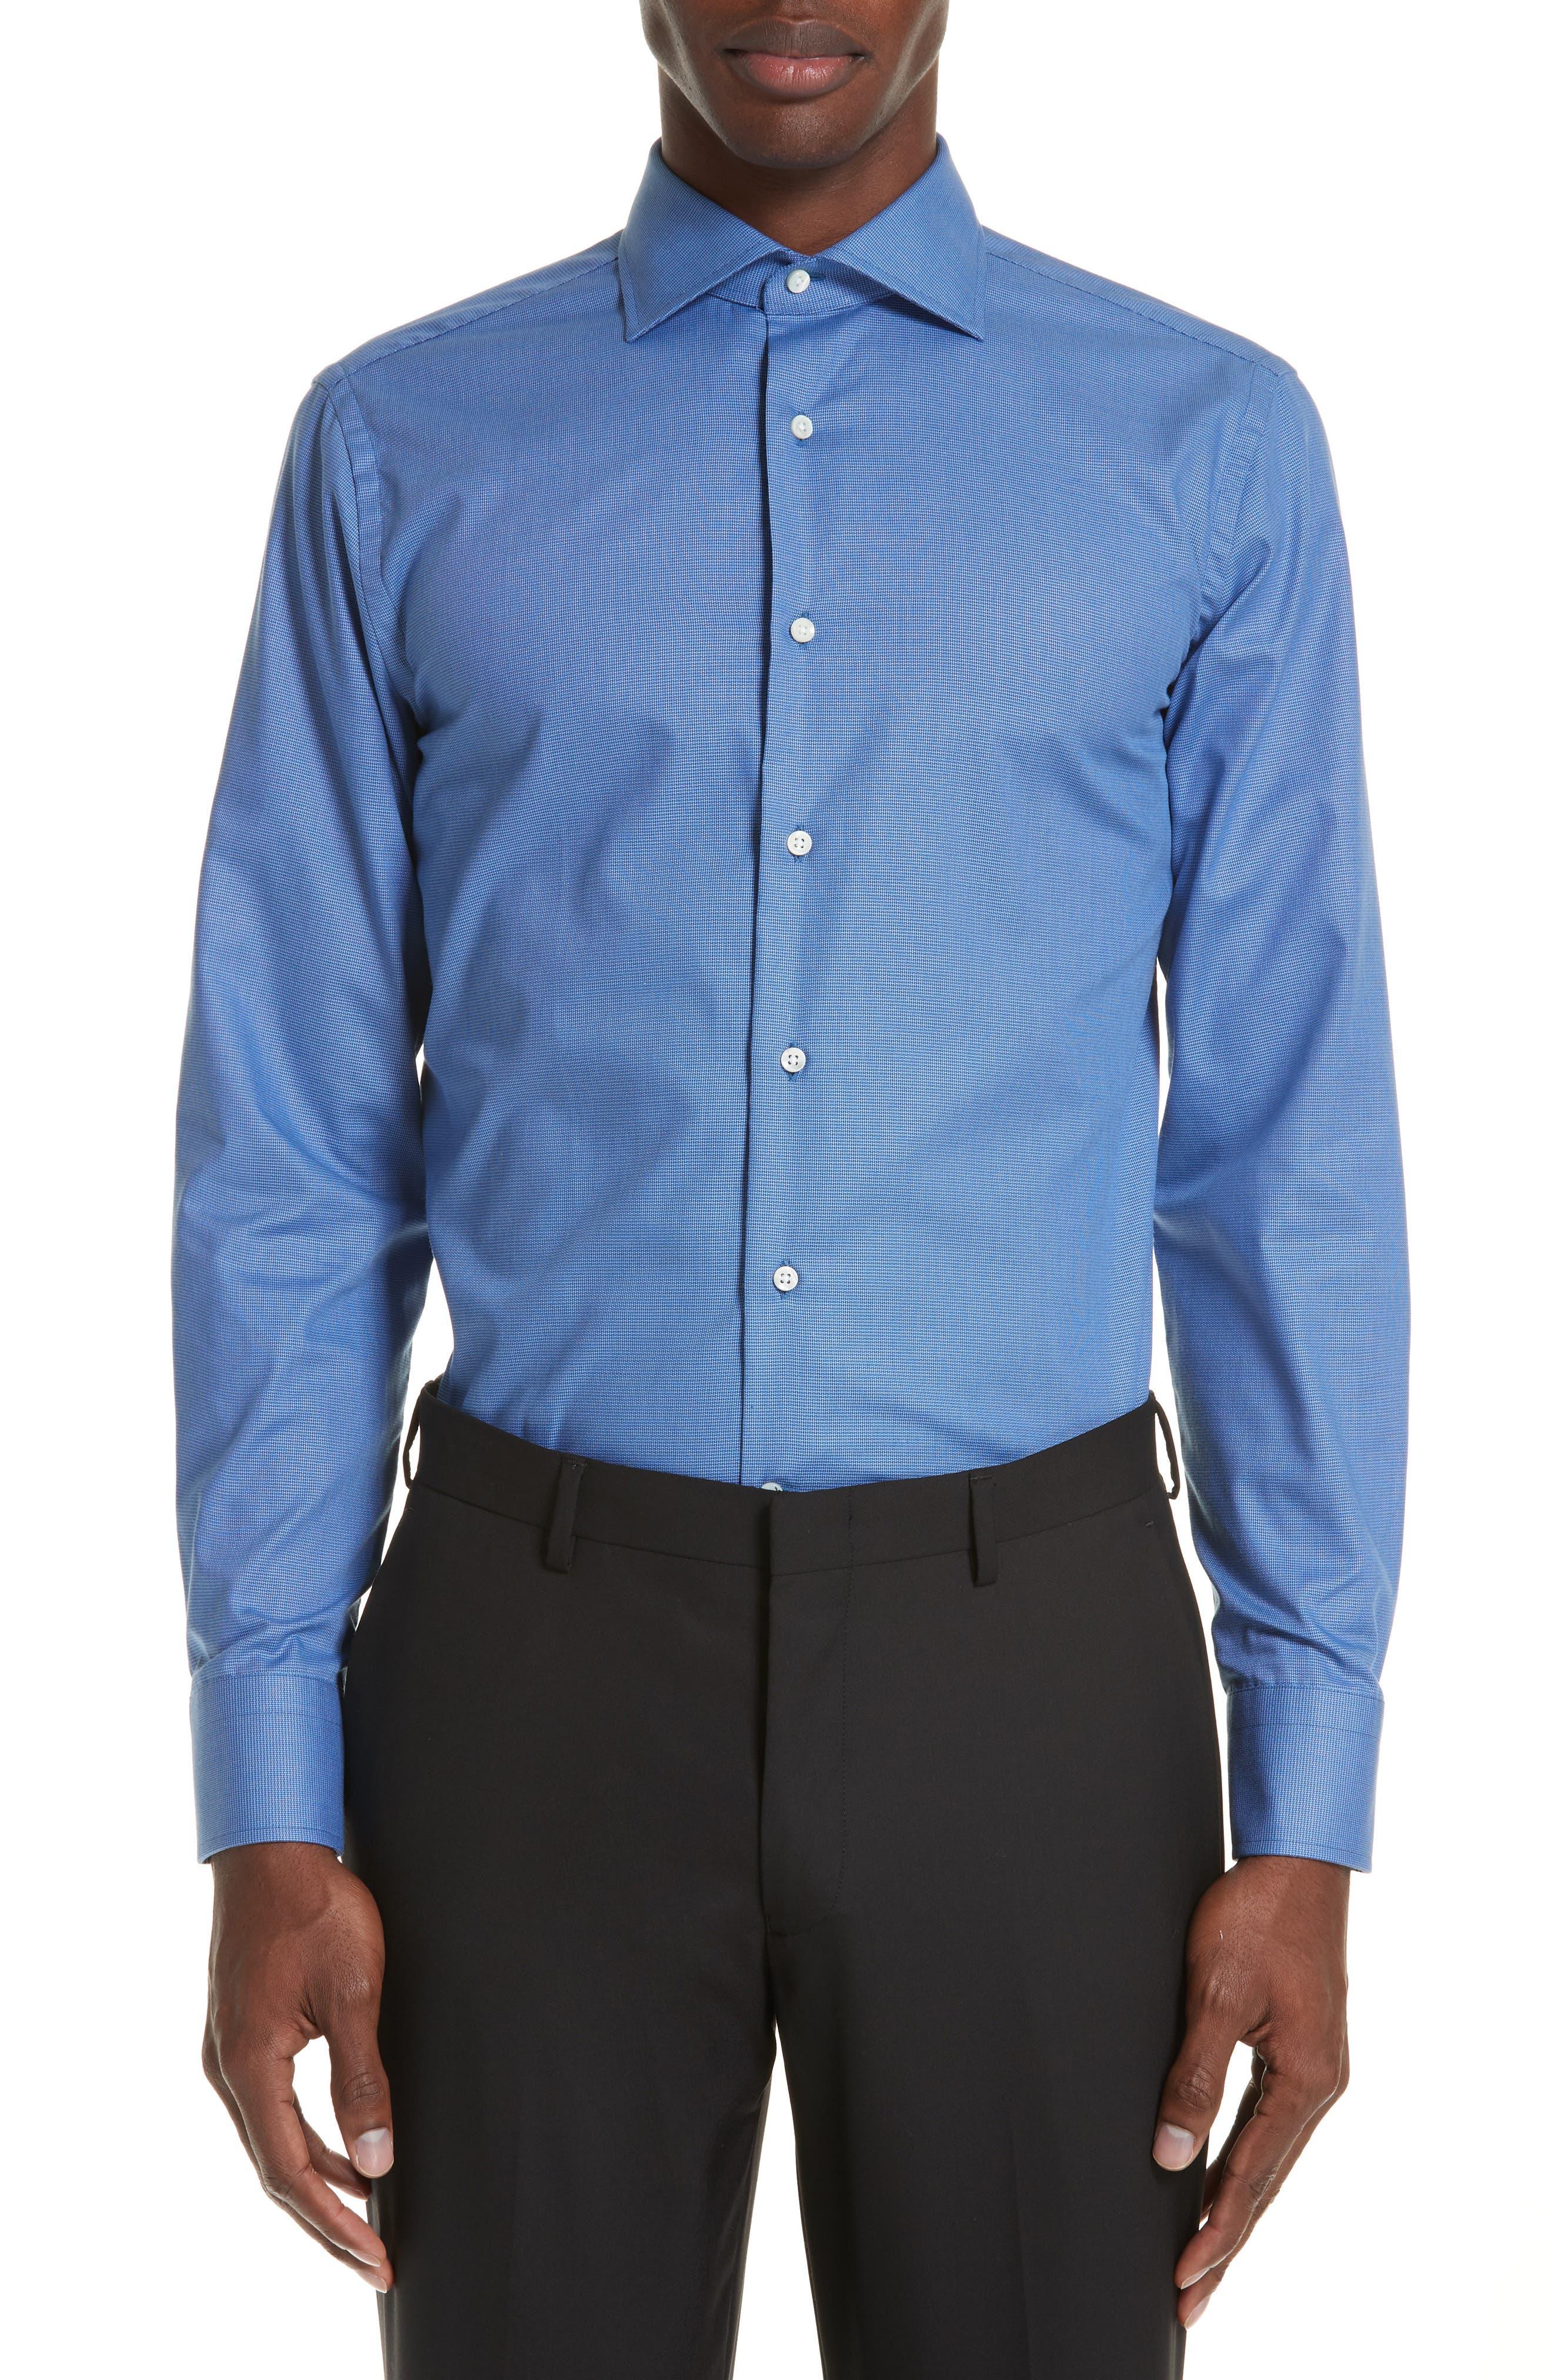 Regular Fit Dress Shirt,                             Main thumbnail 1, color,                             Dark Blue